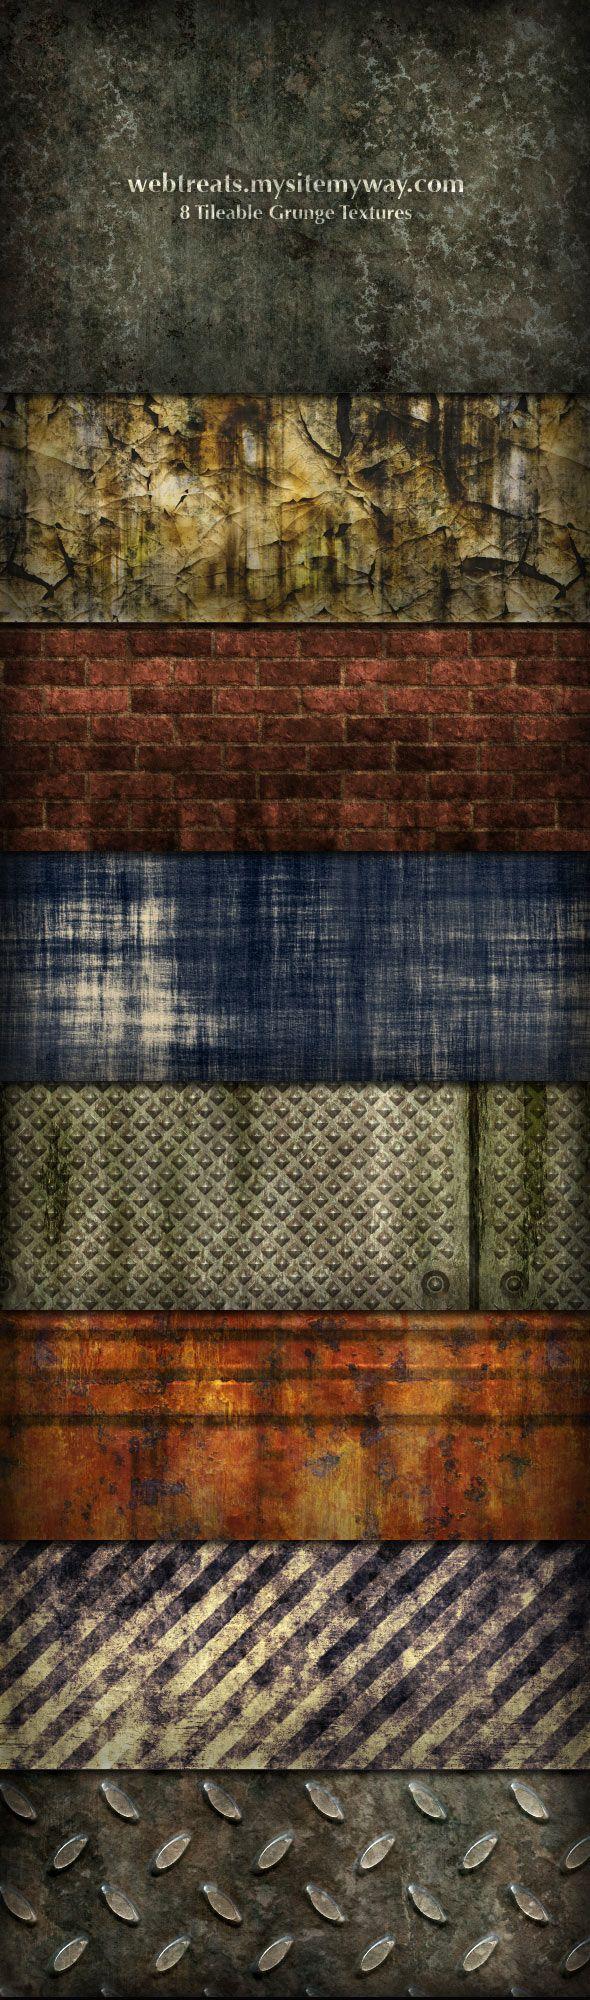 Grunge Textures and Patterns by WebTreatsETC.deviantart.com on @deviantART